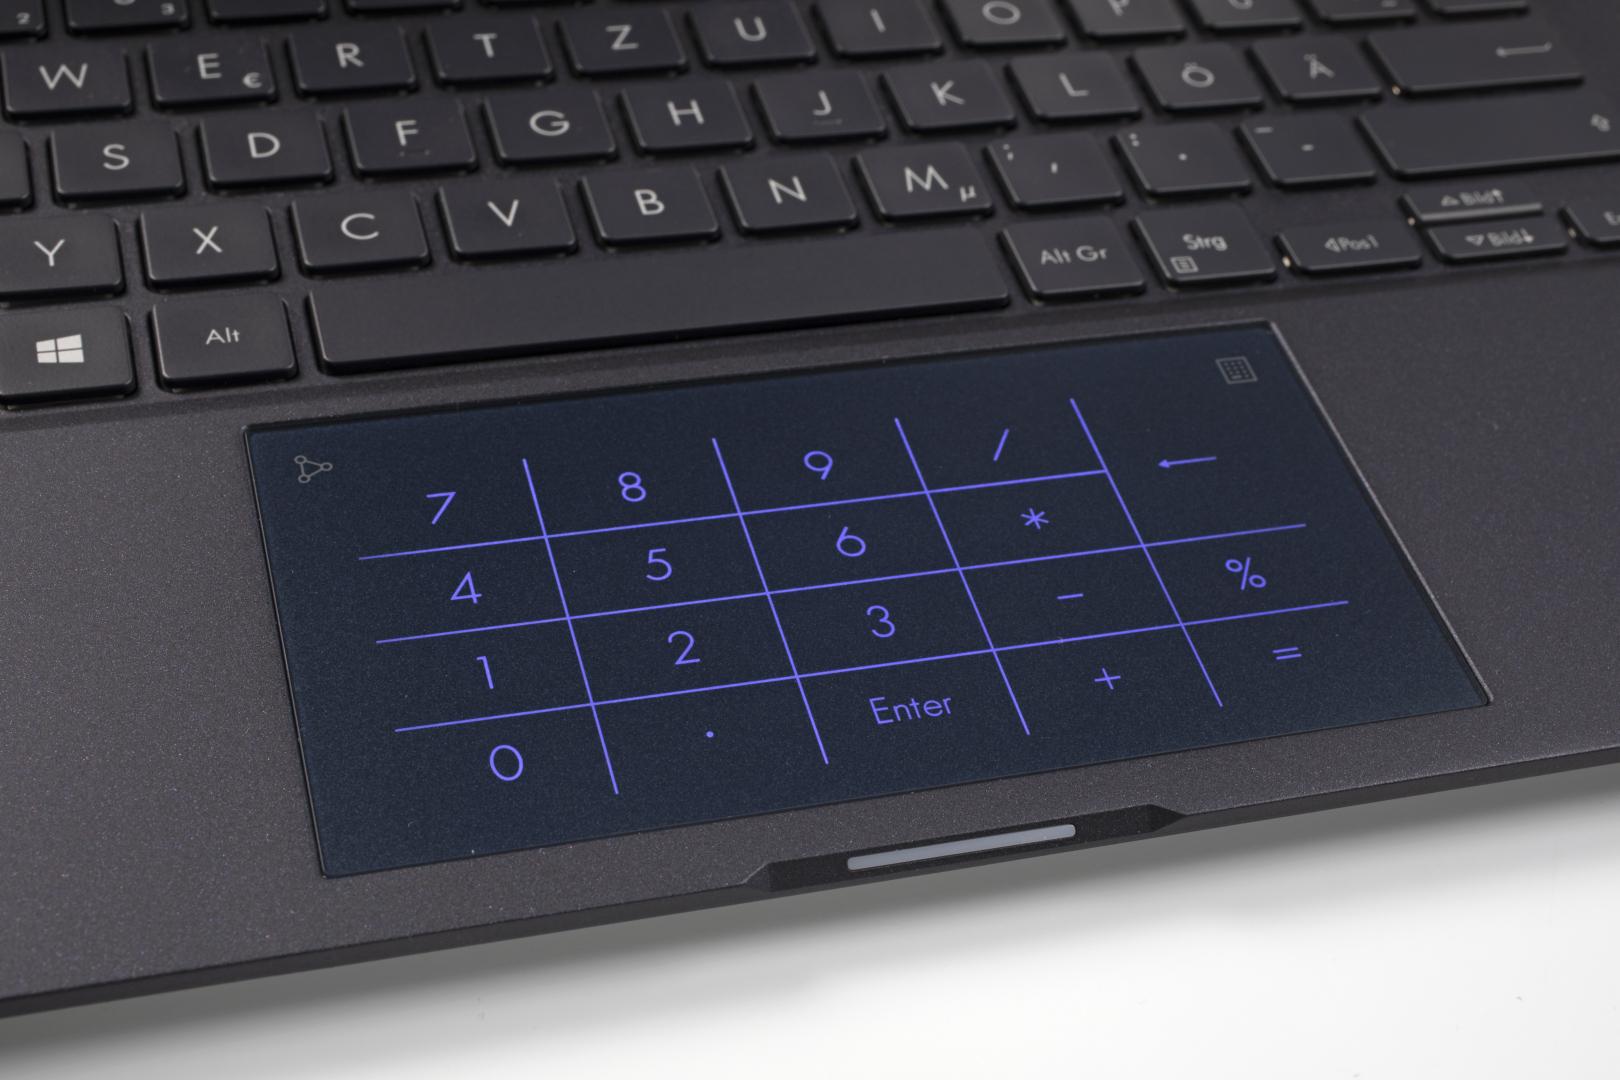 touchpad Asus laptop cijferblok numeriek toetsenblok